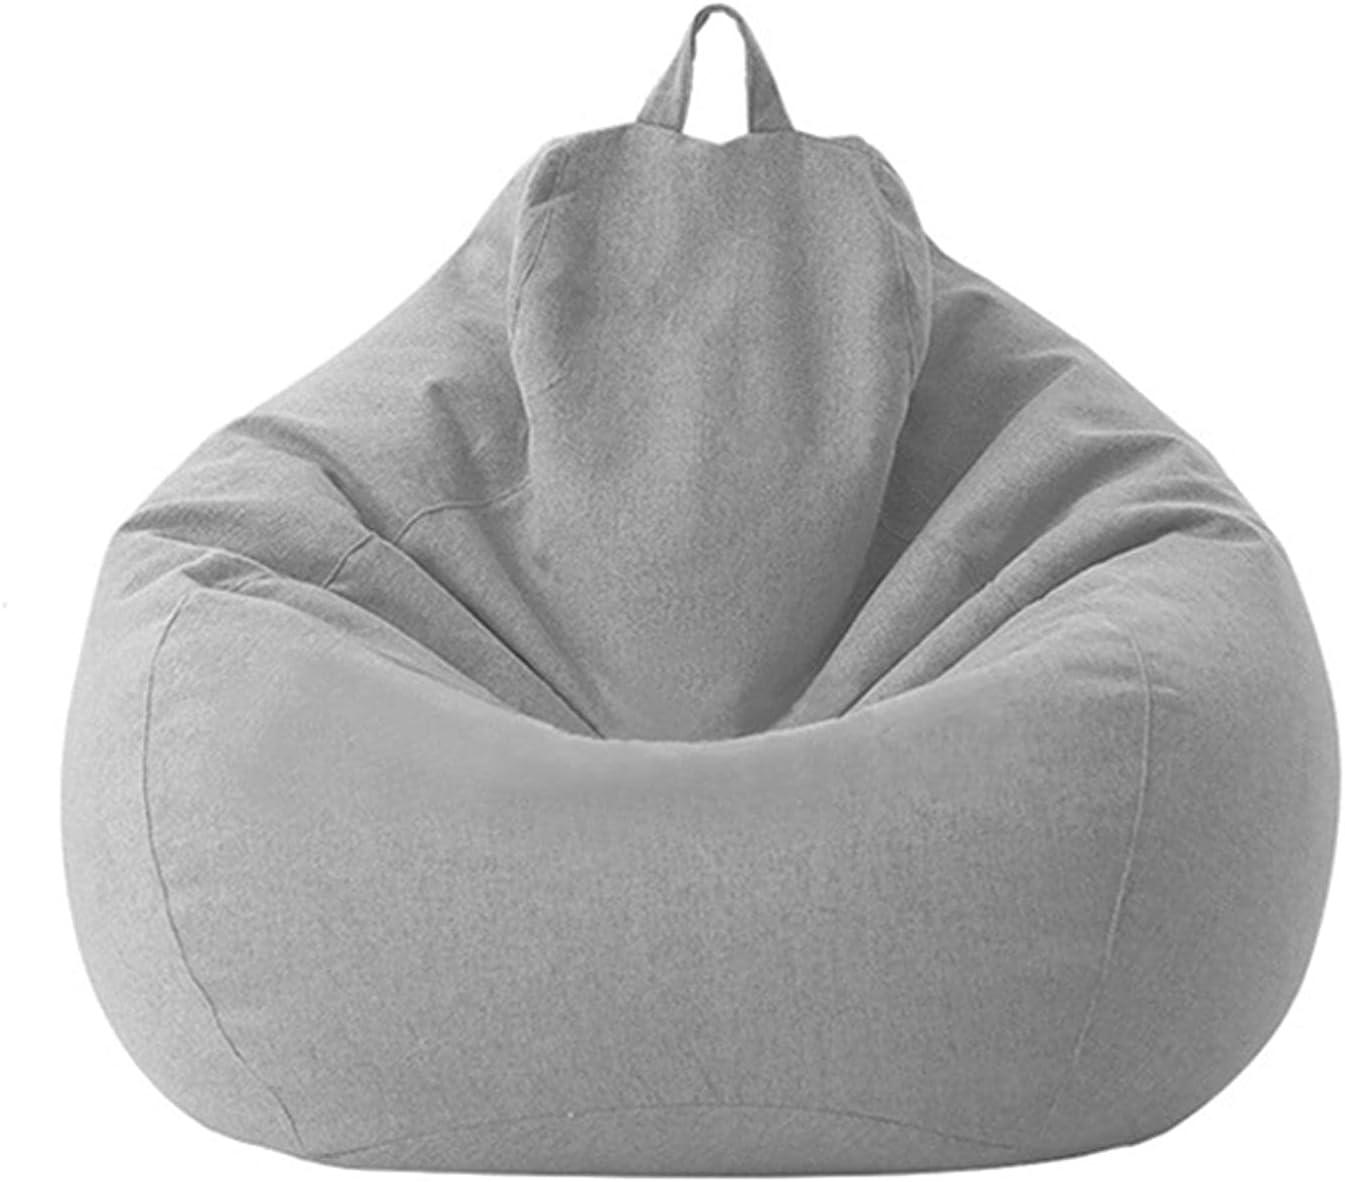 Superior Bean free shipping Bag Cover Cozy Plush Toy Slipc Sofa Bags Chair Storage